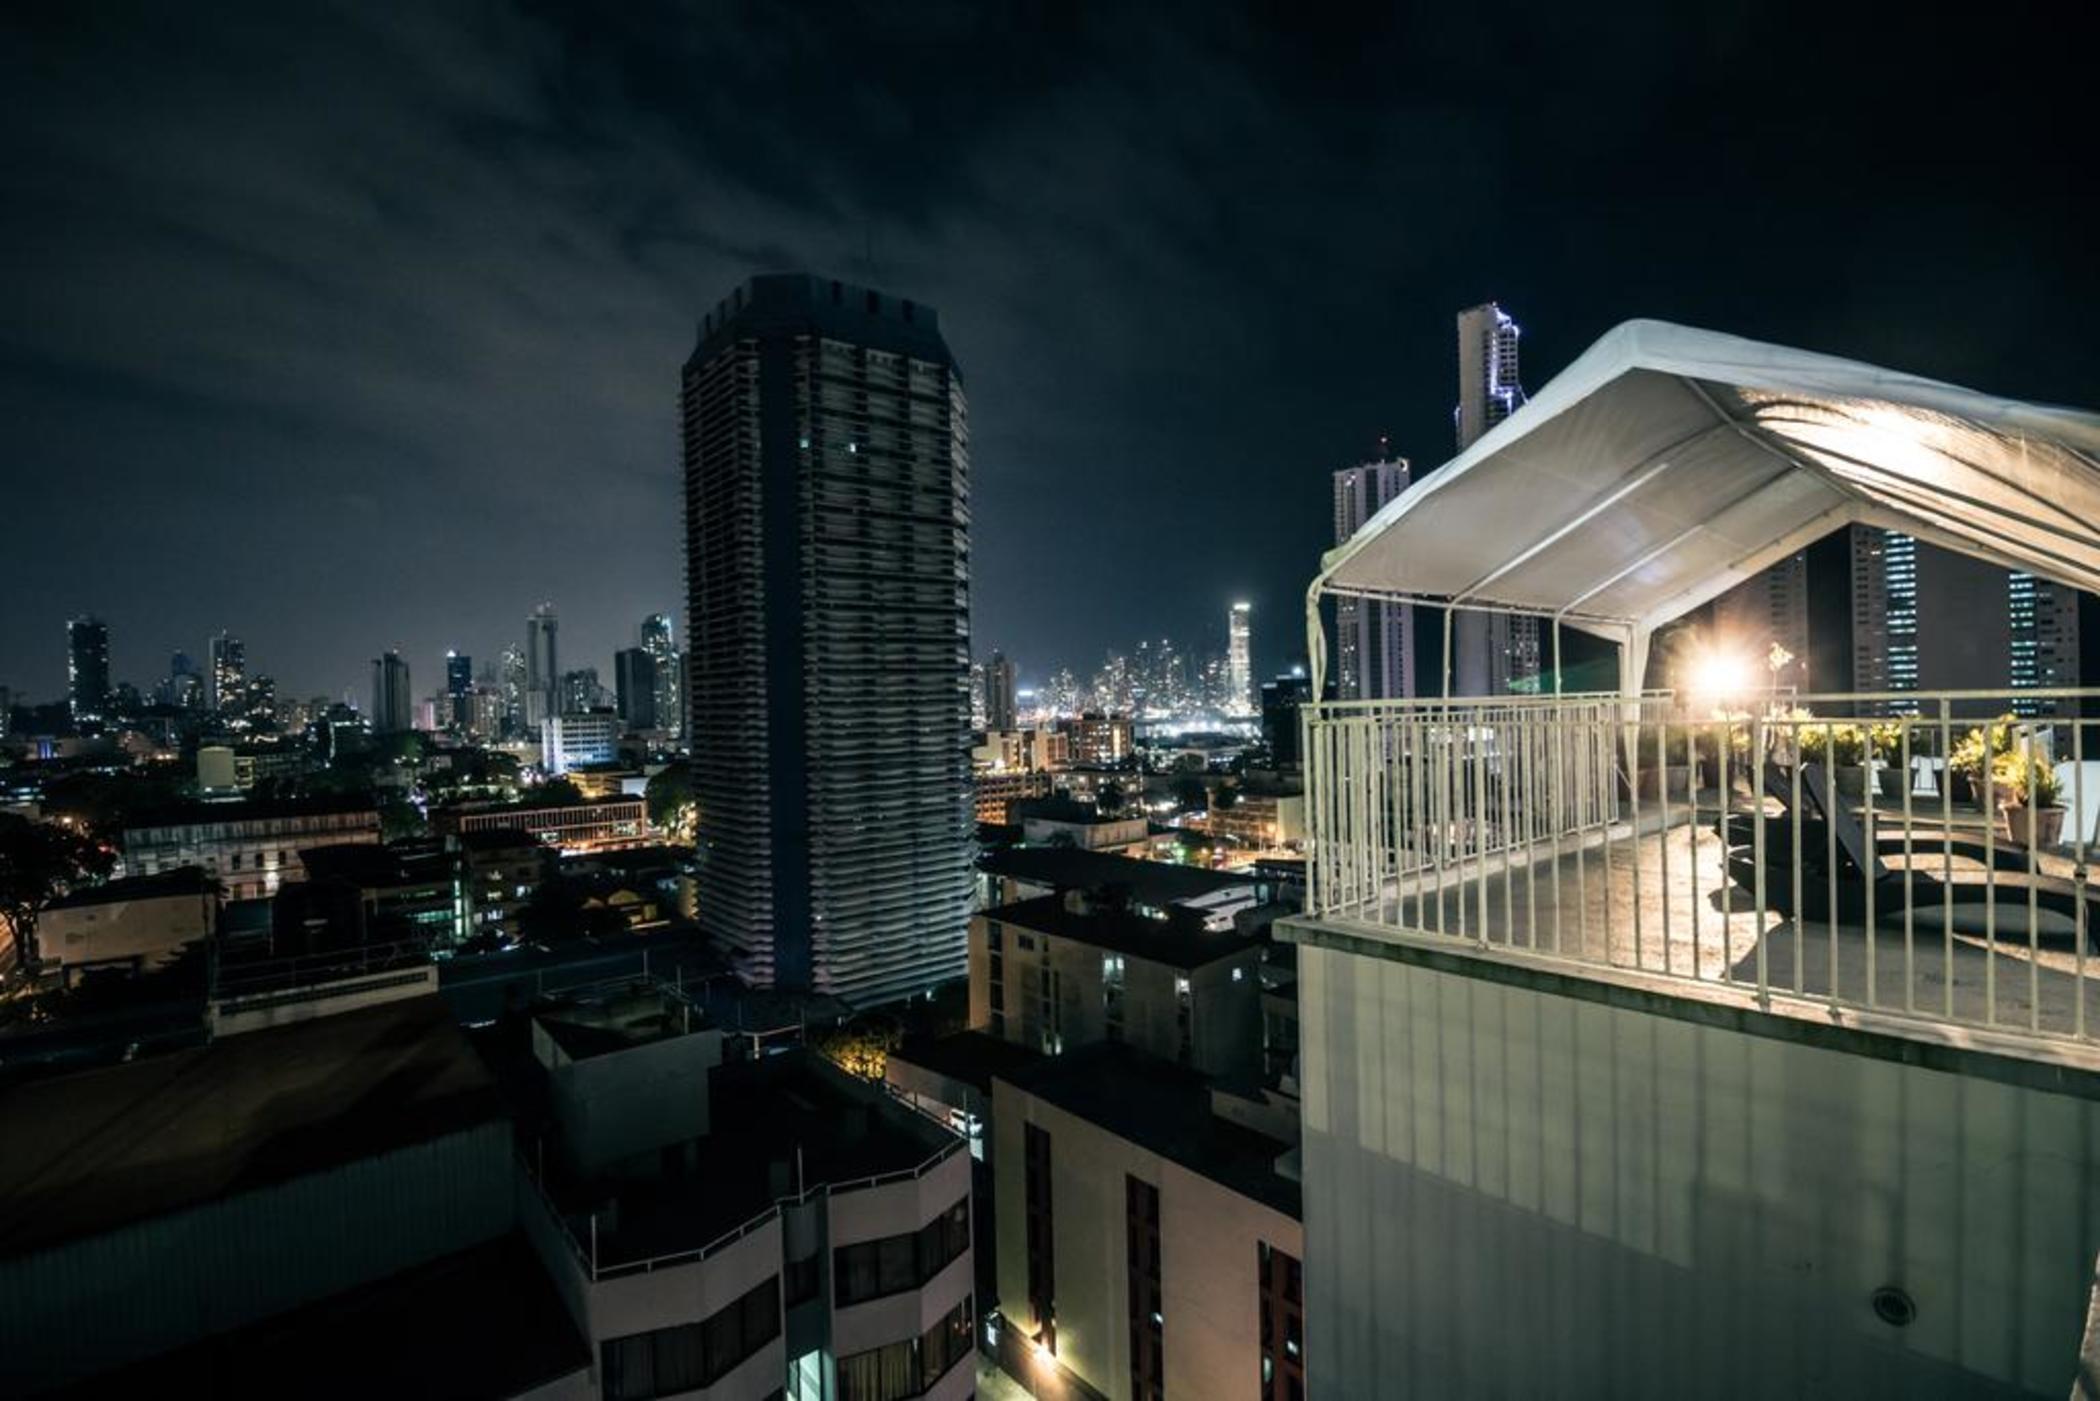 Gran Hotel Soloy & Casino, Panamá